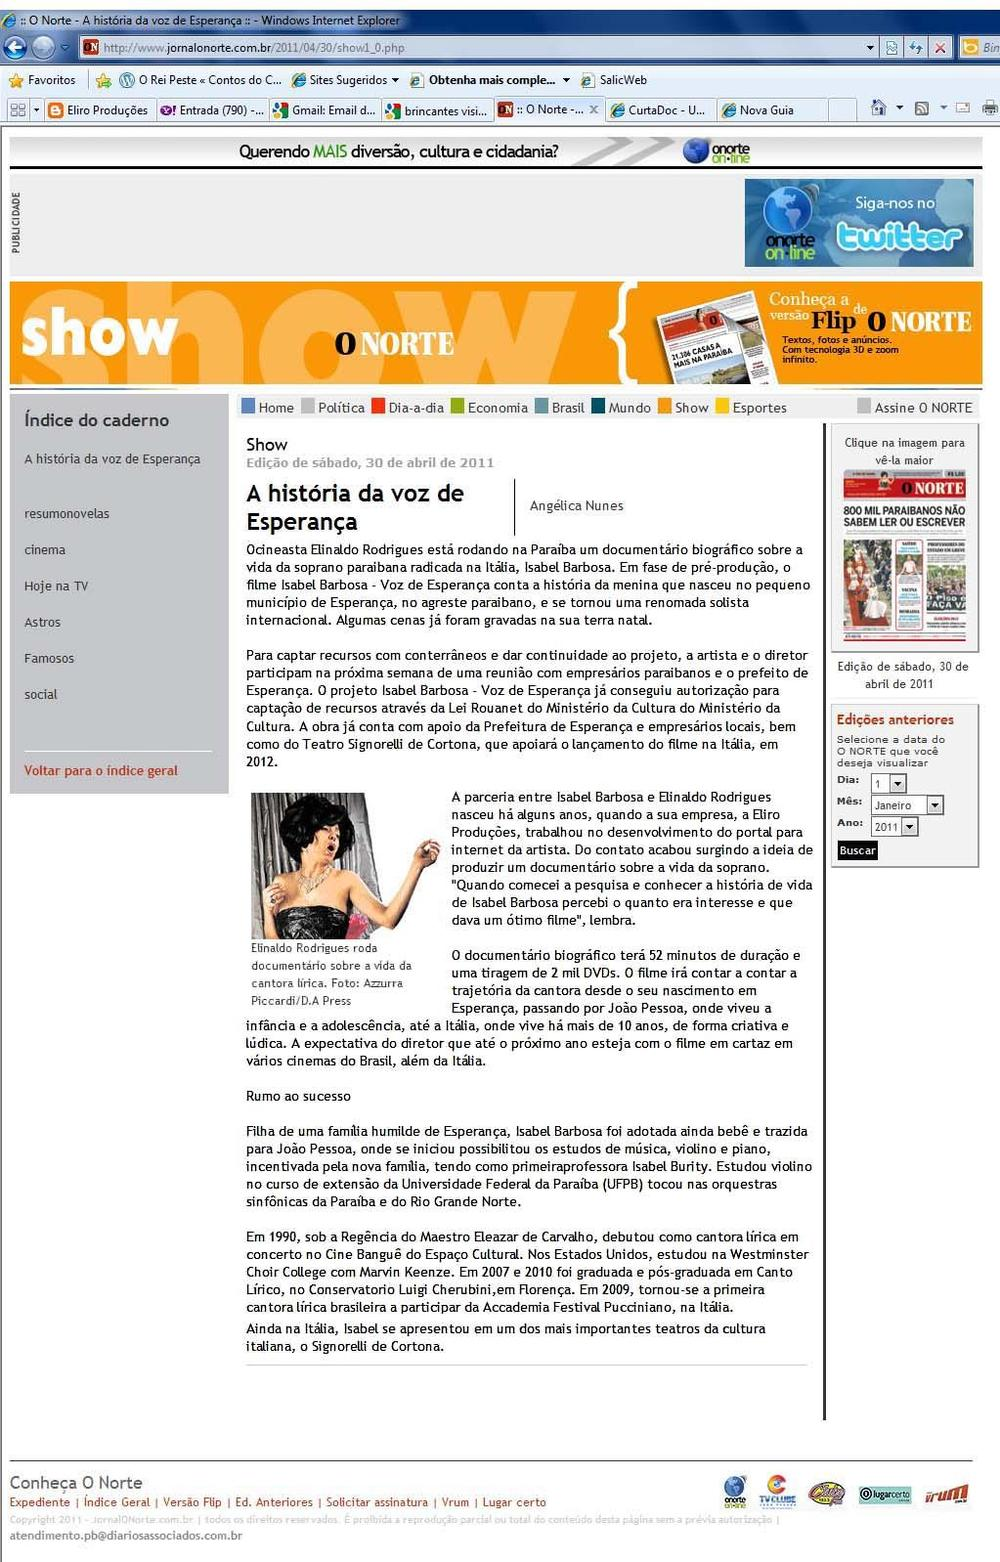 __UNICA-COPYRIGHT___isabel_barbosa__voz_de_esperanca_materia_jornal_o_norte_.jpg